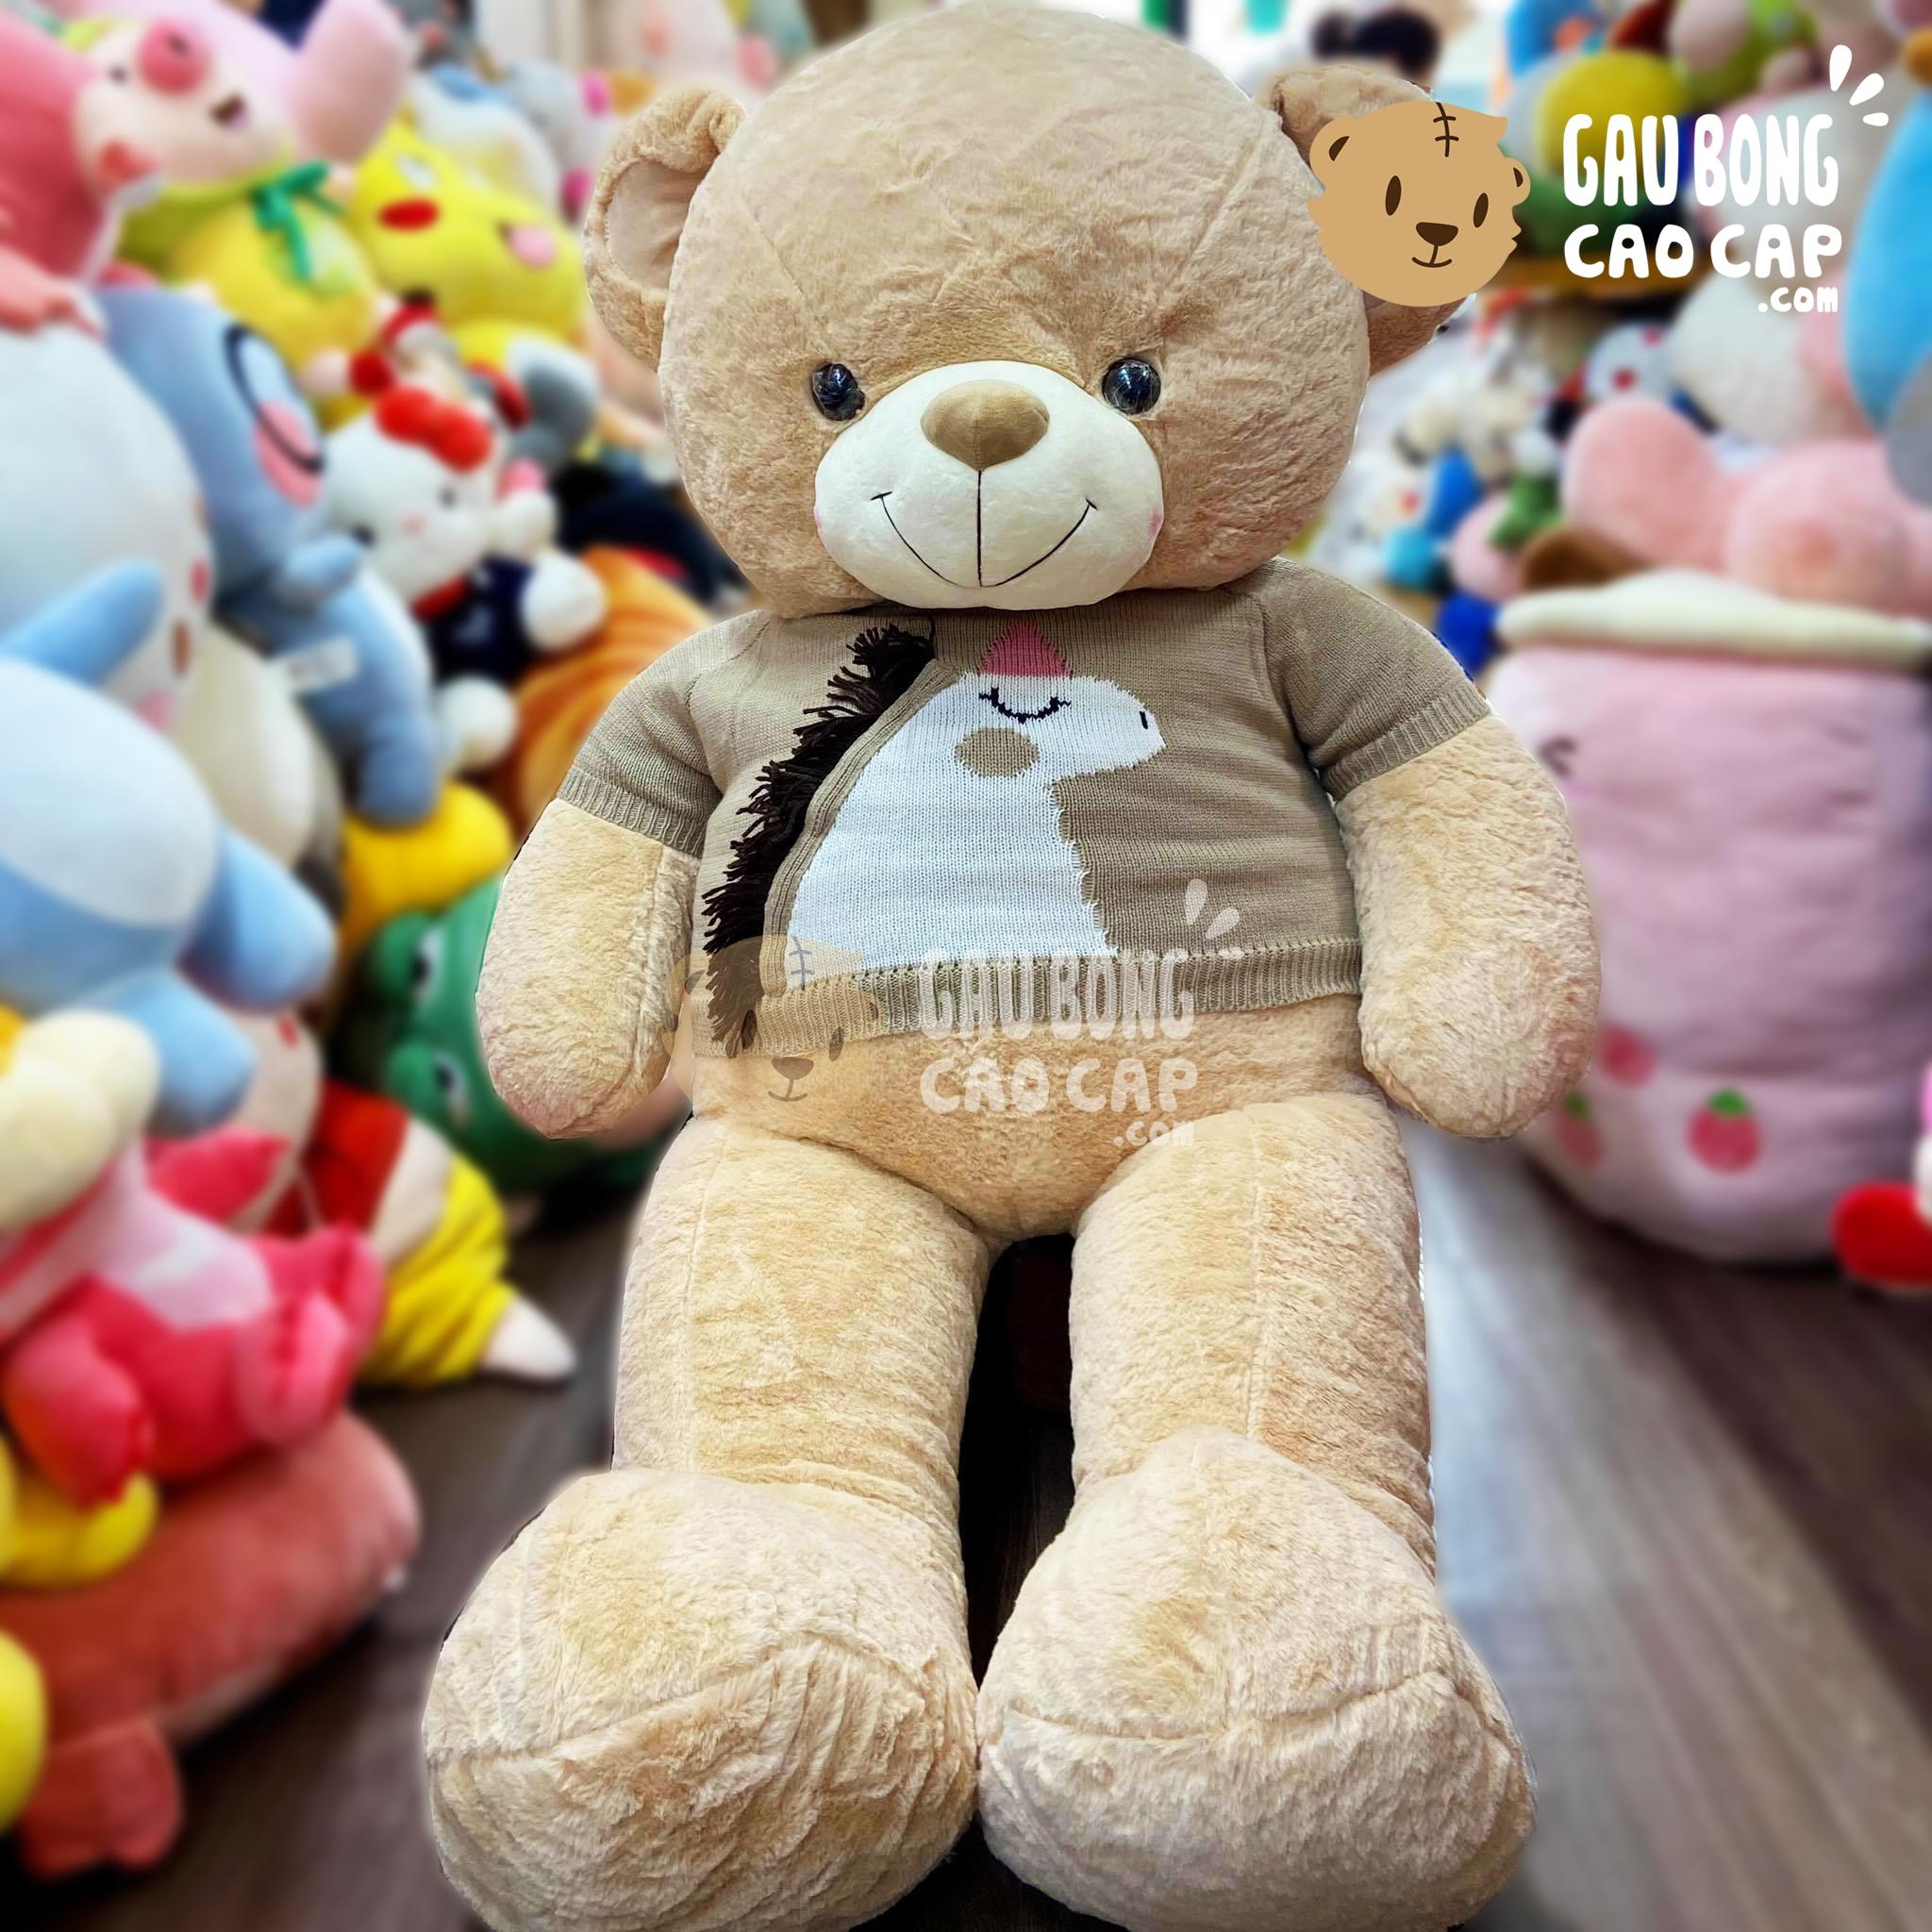 Gấu Teddy Smooth mặc áo len Thêu Unicorn